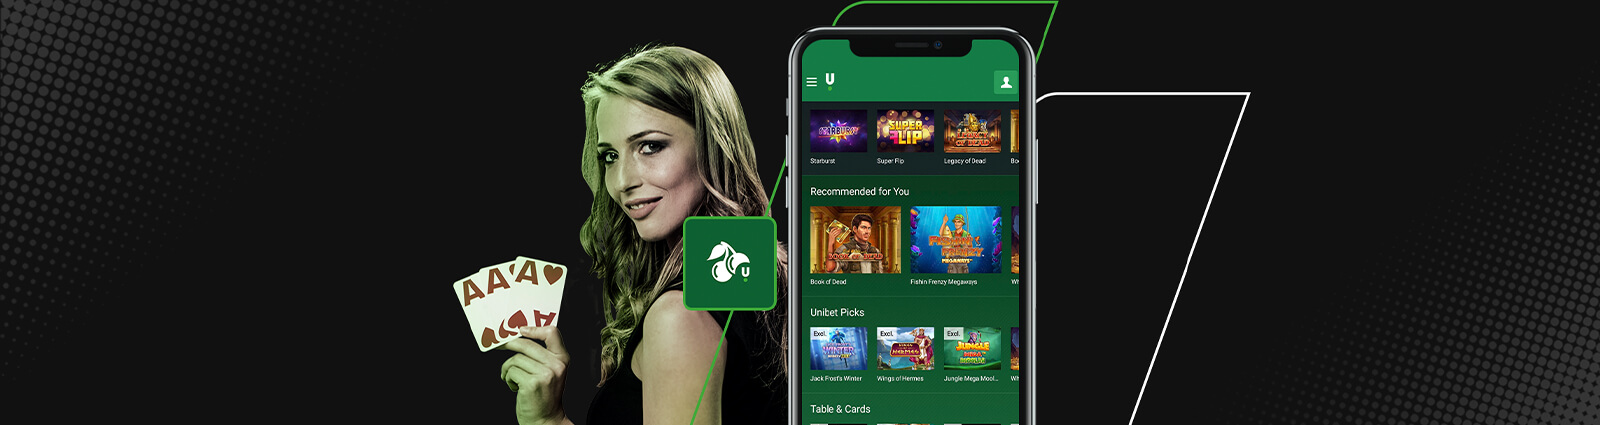 17660-promo-page-banner-update-sb-ca-app-images-onsite-generic-casino-un-ro-2021.jpg